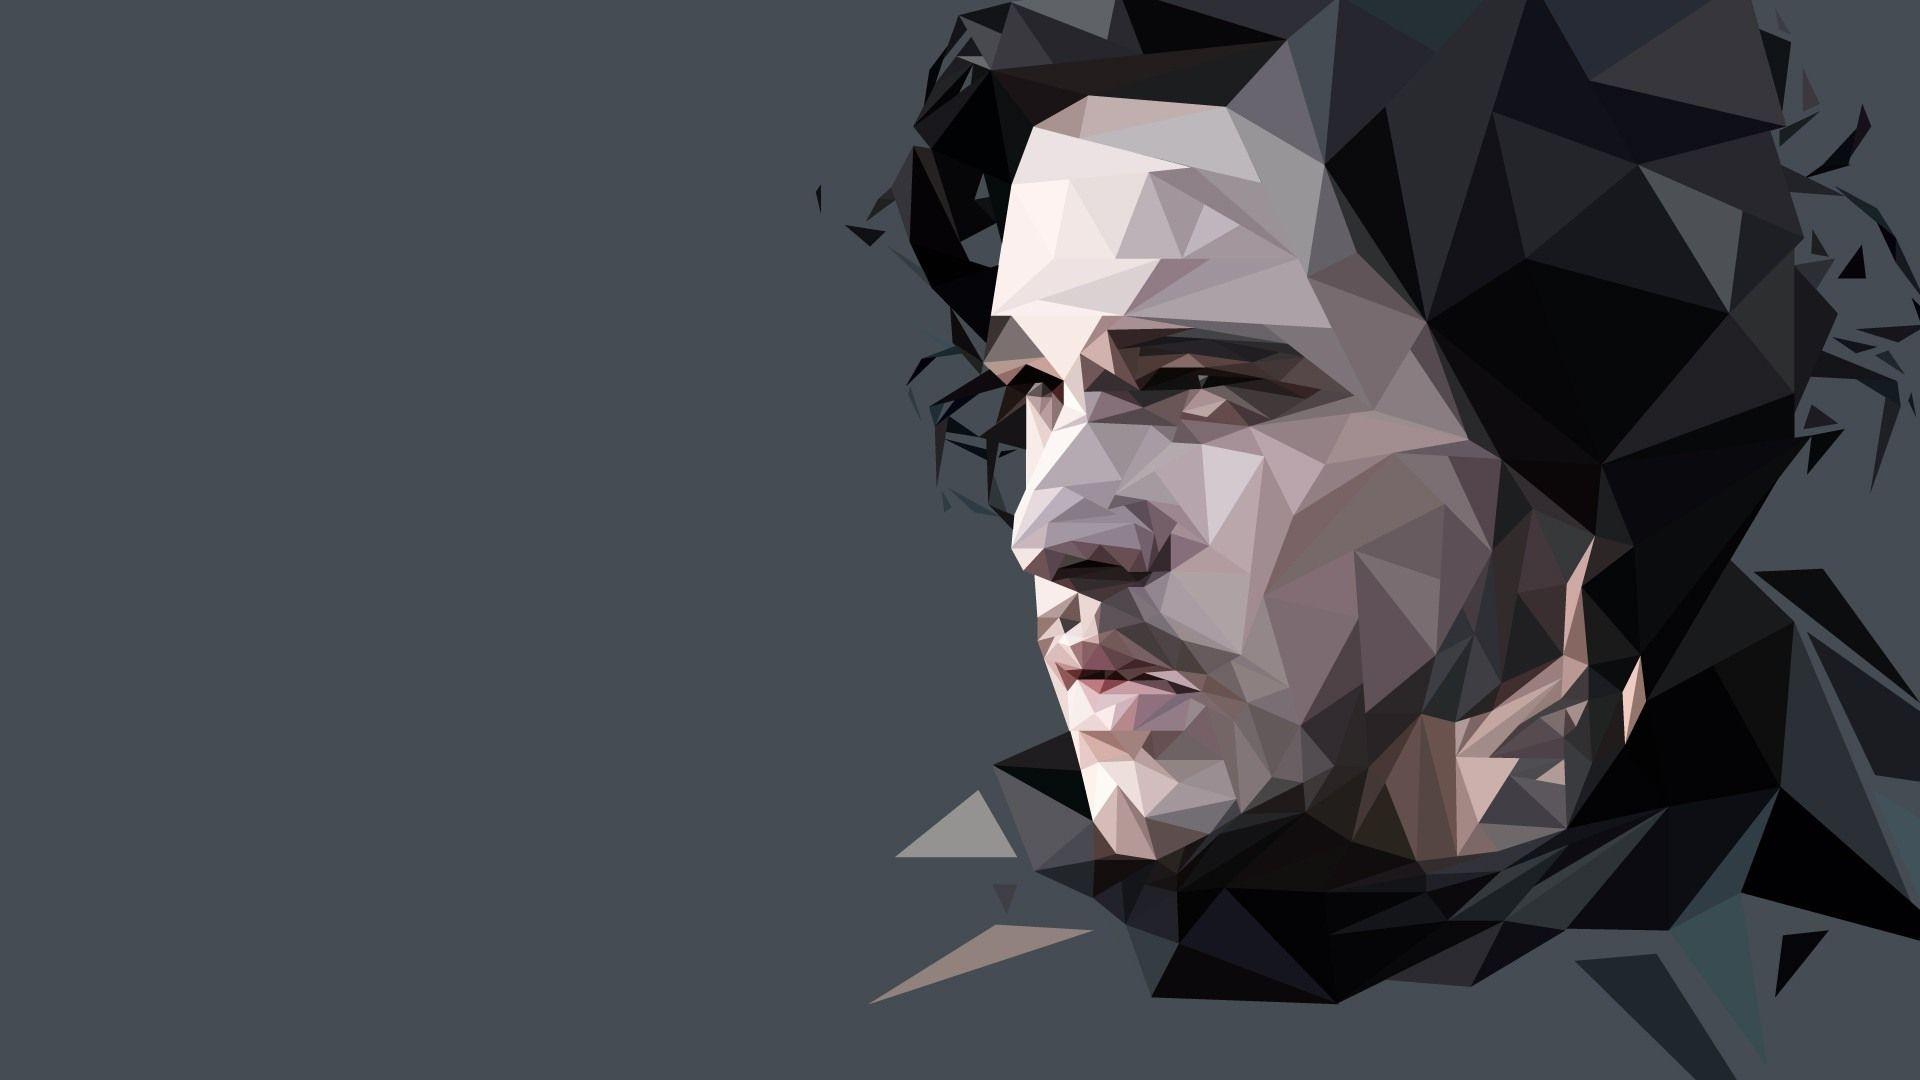 Jon Snow polygon Game of Thrones